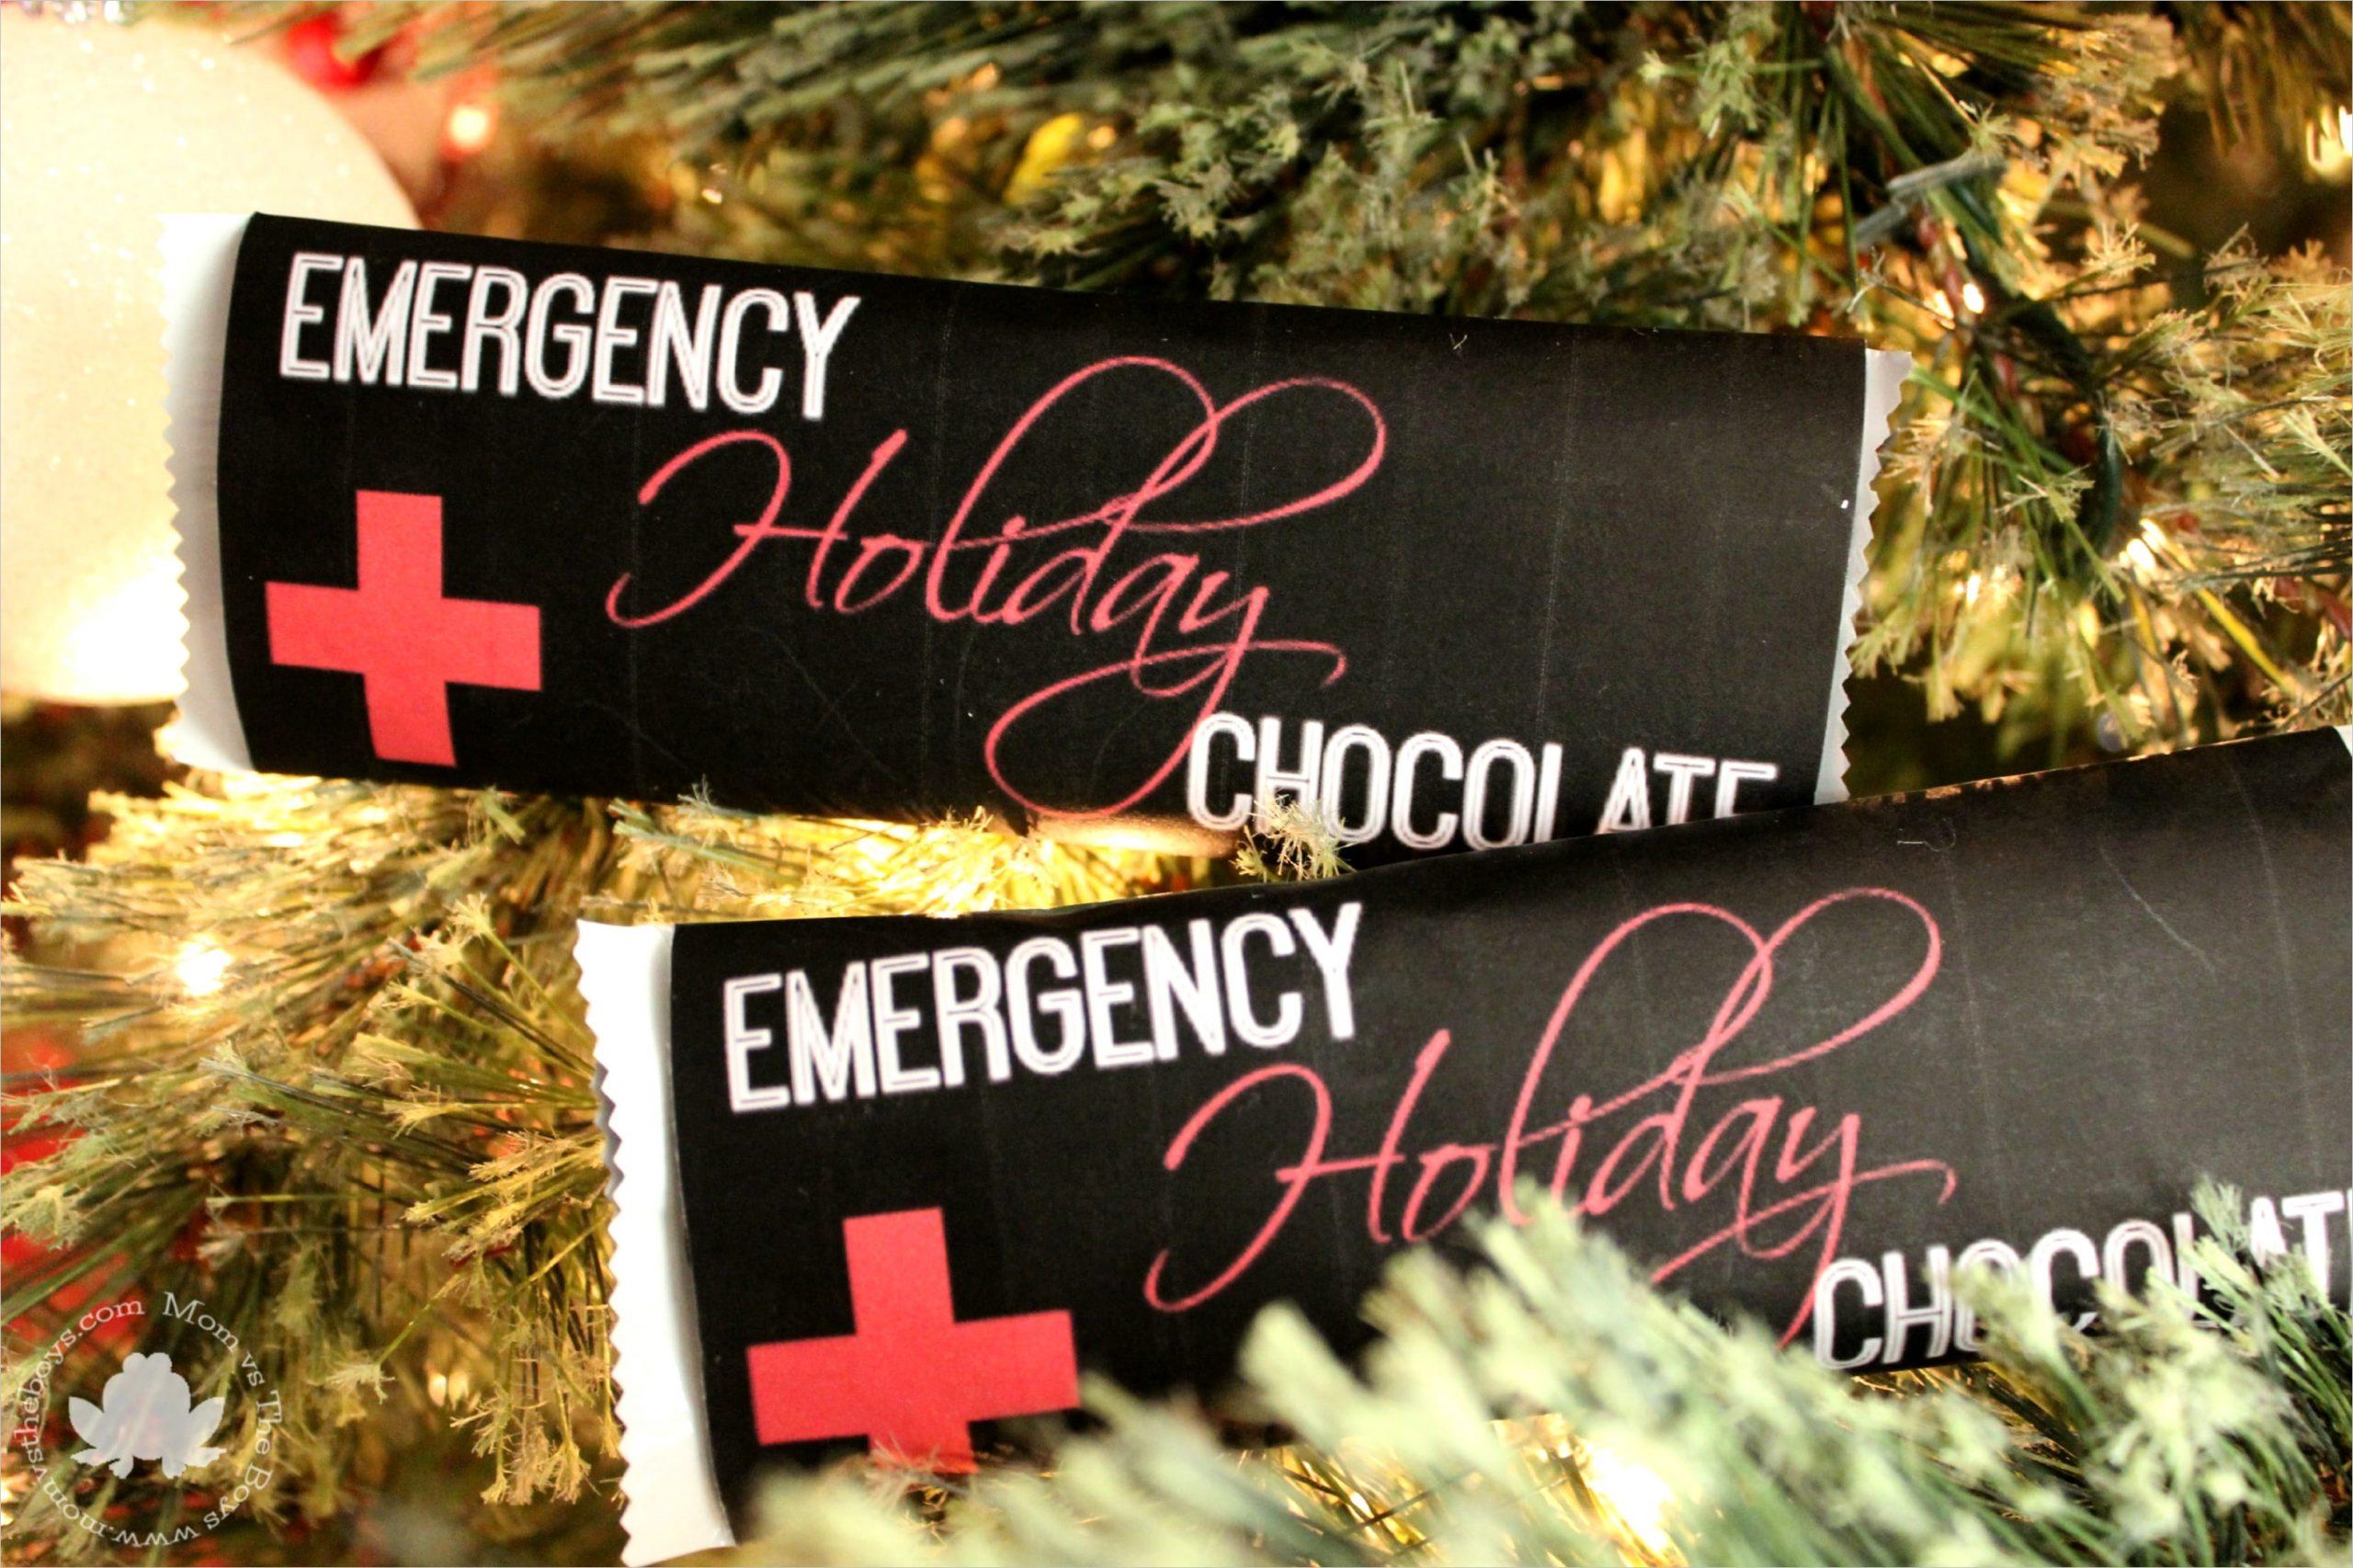 emergency holiday chocolate